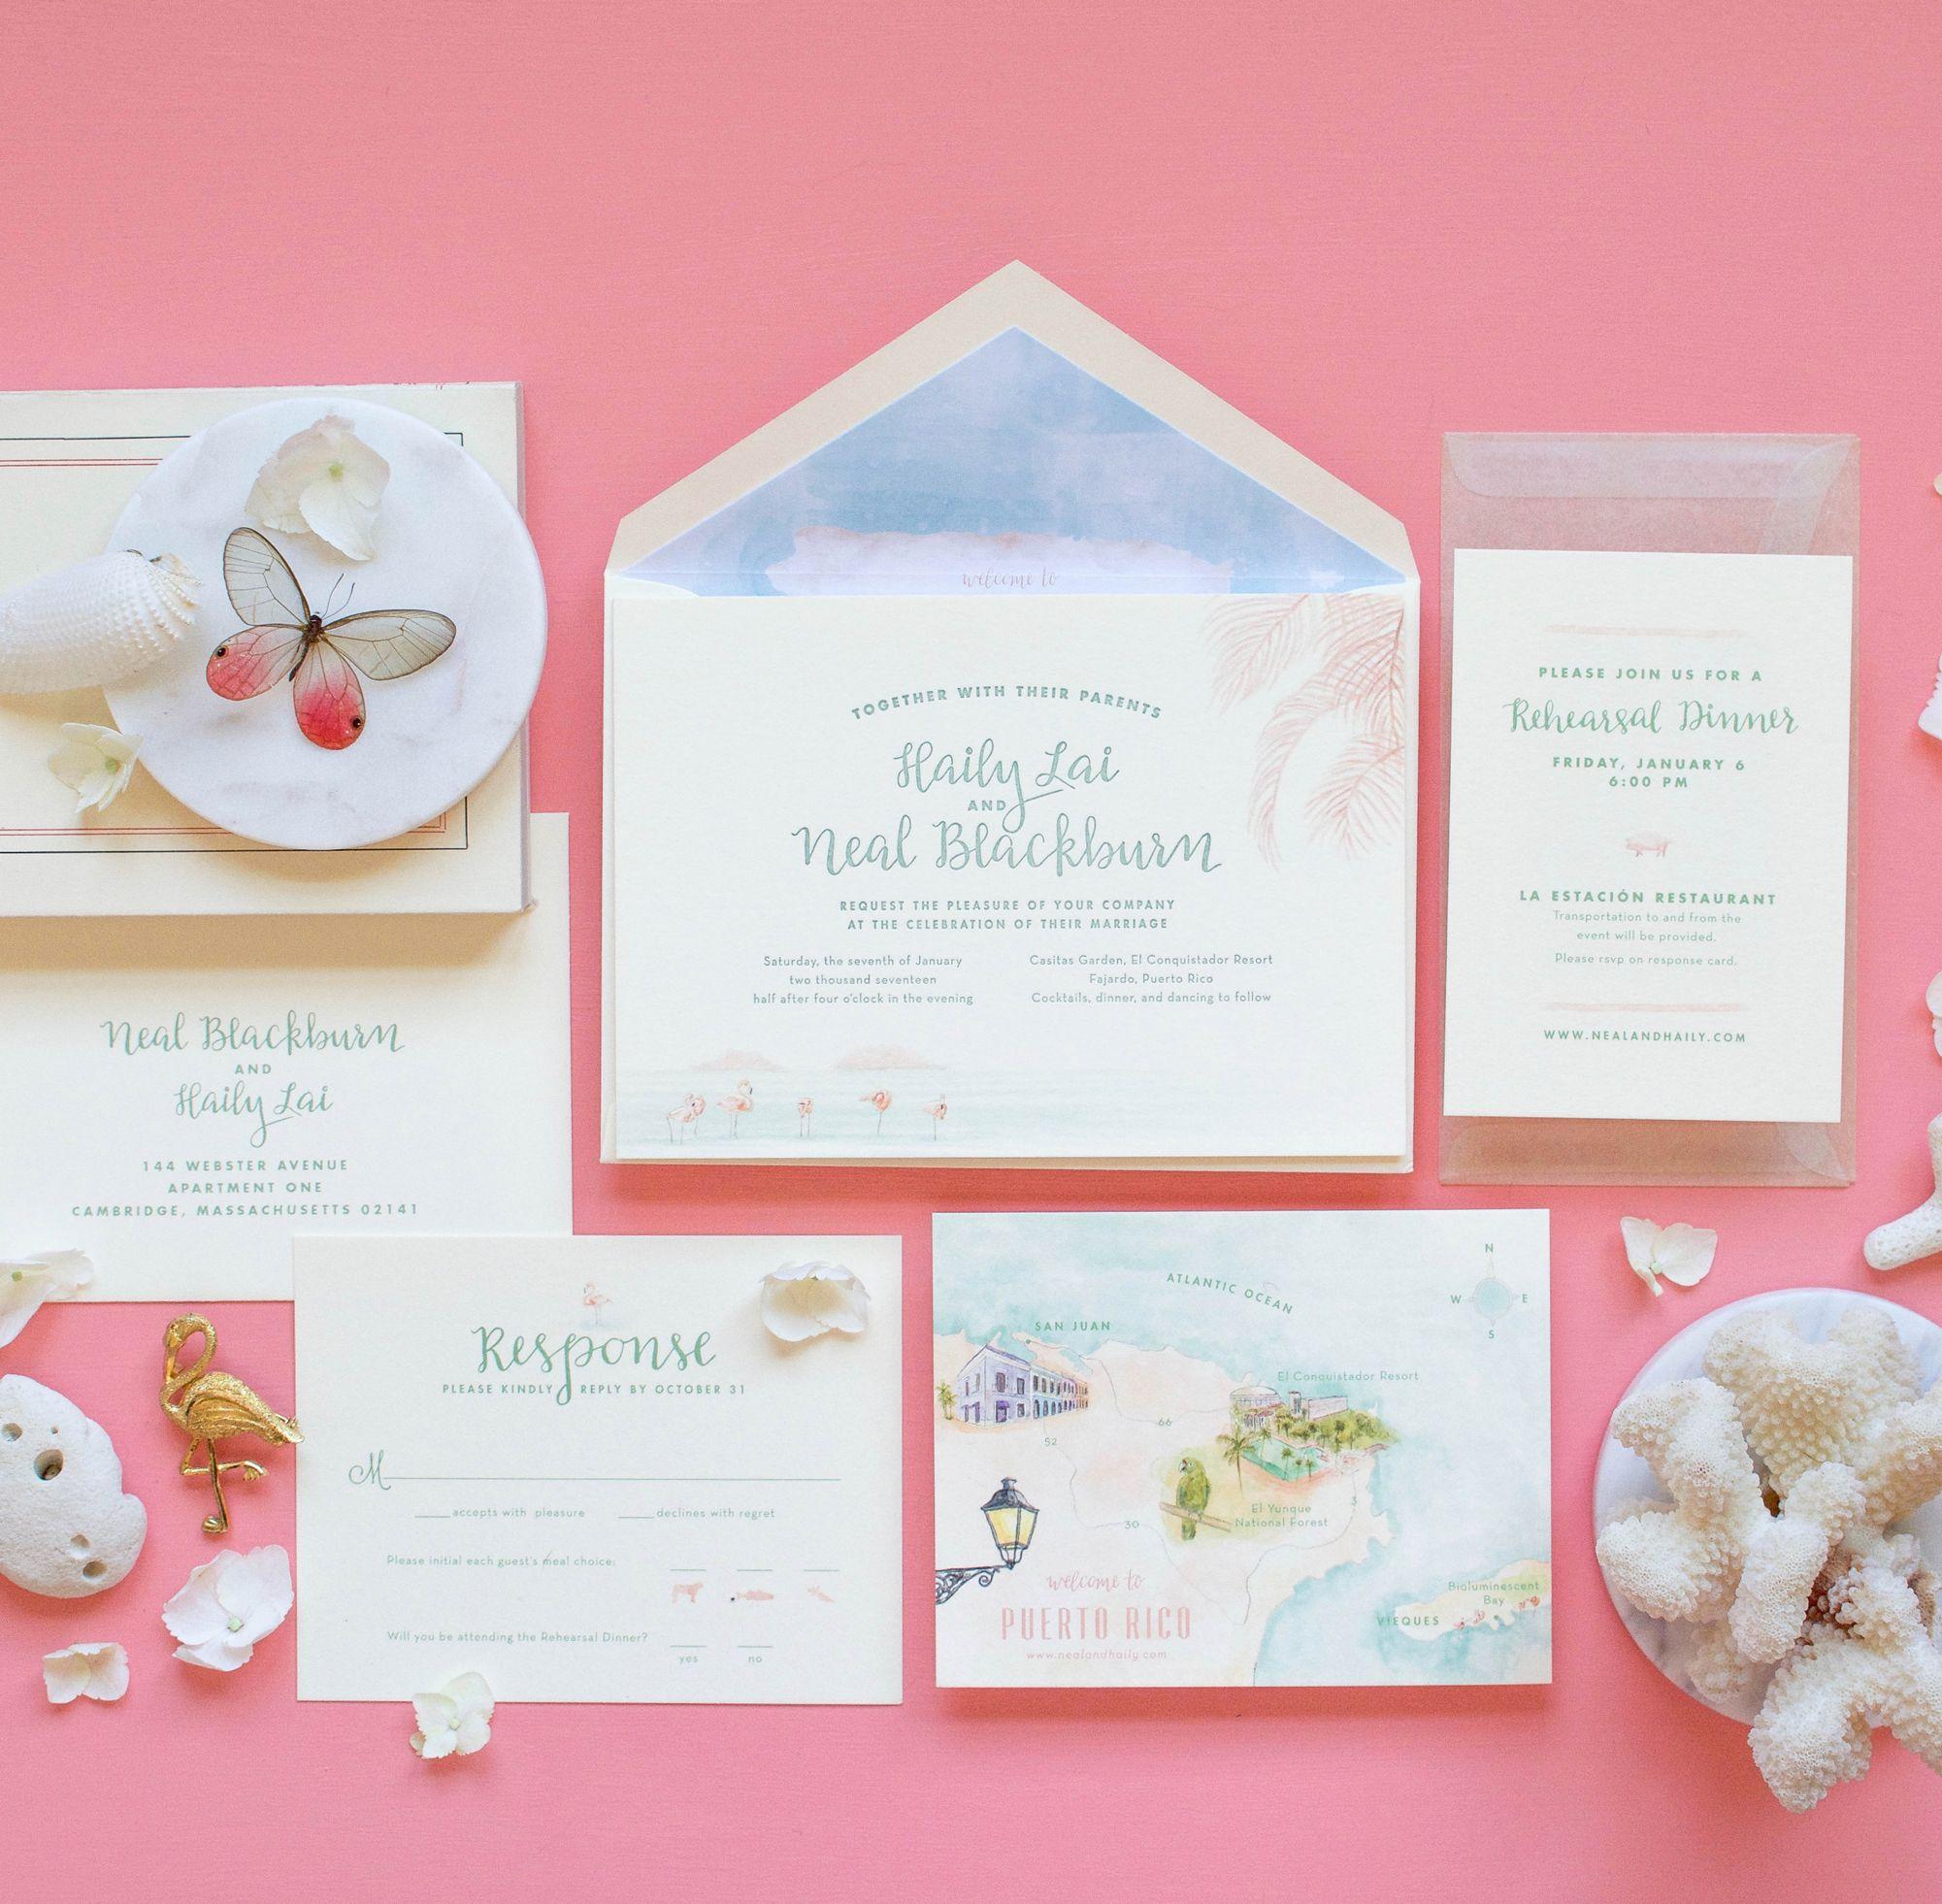 Puerto Rico watercolor wedding invitation with letterpress details ...